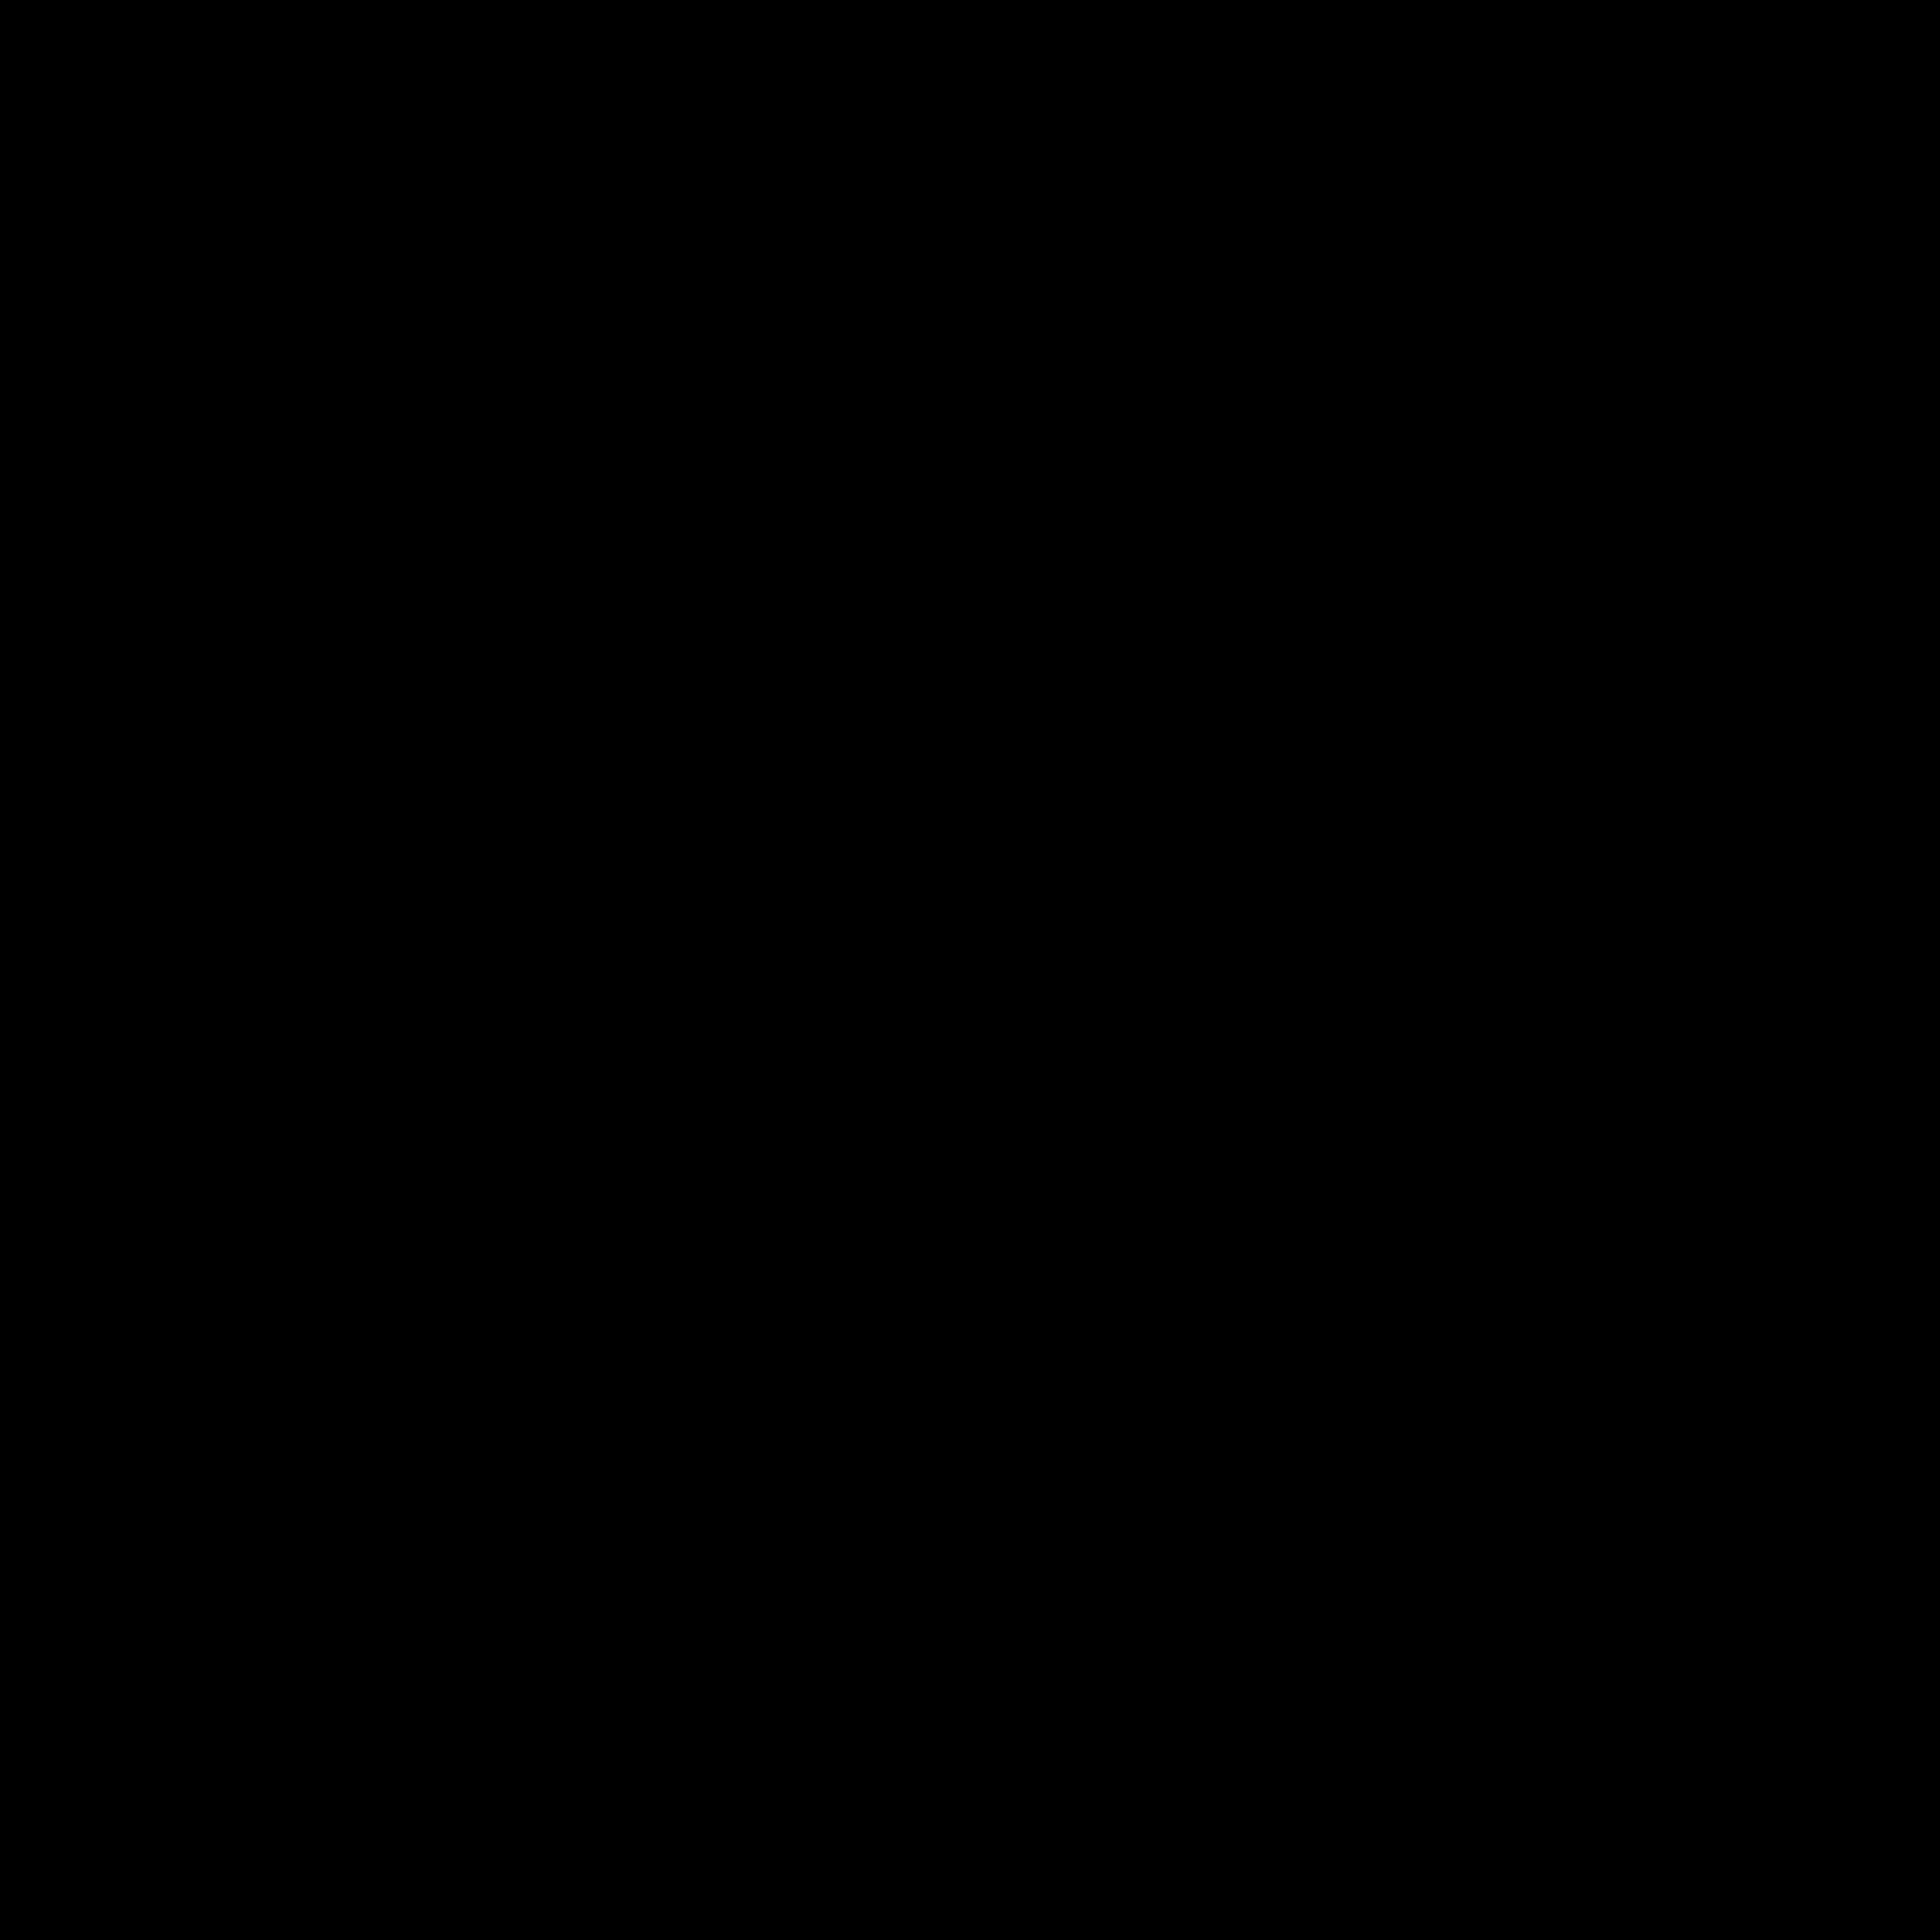 Daytona Frey Logo PNG Transparent & SVG Vector.